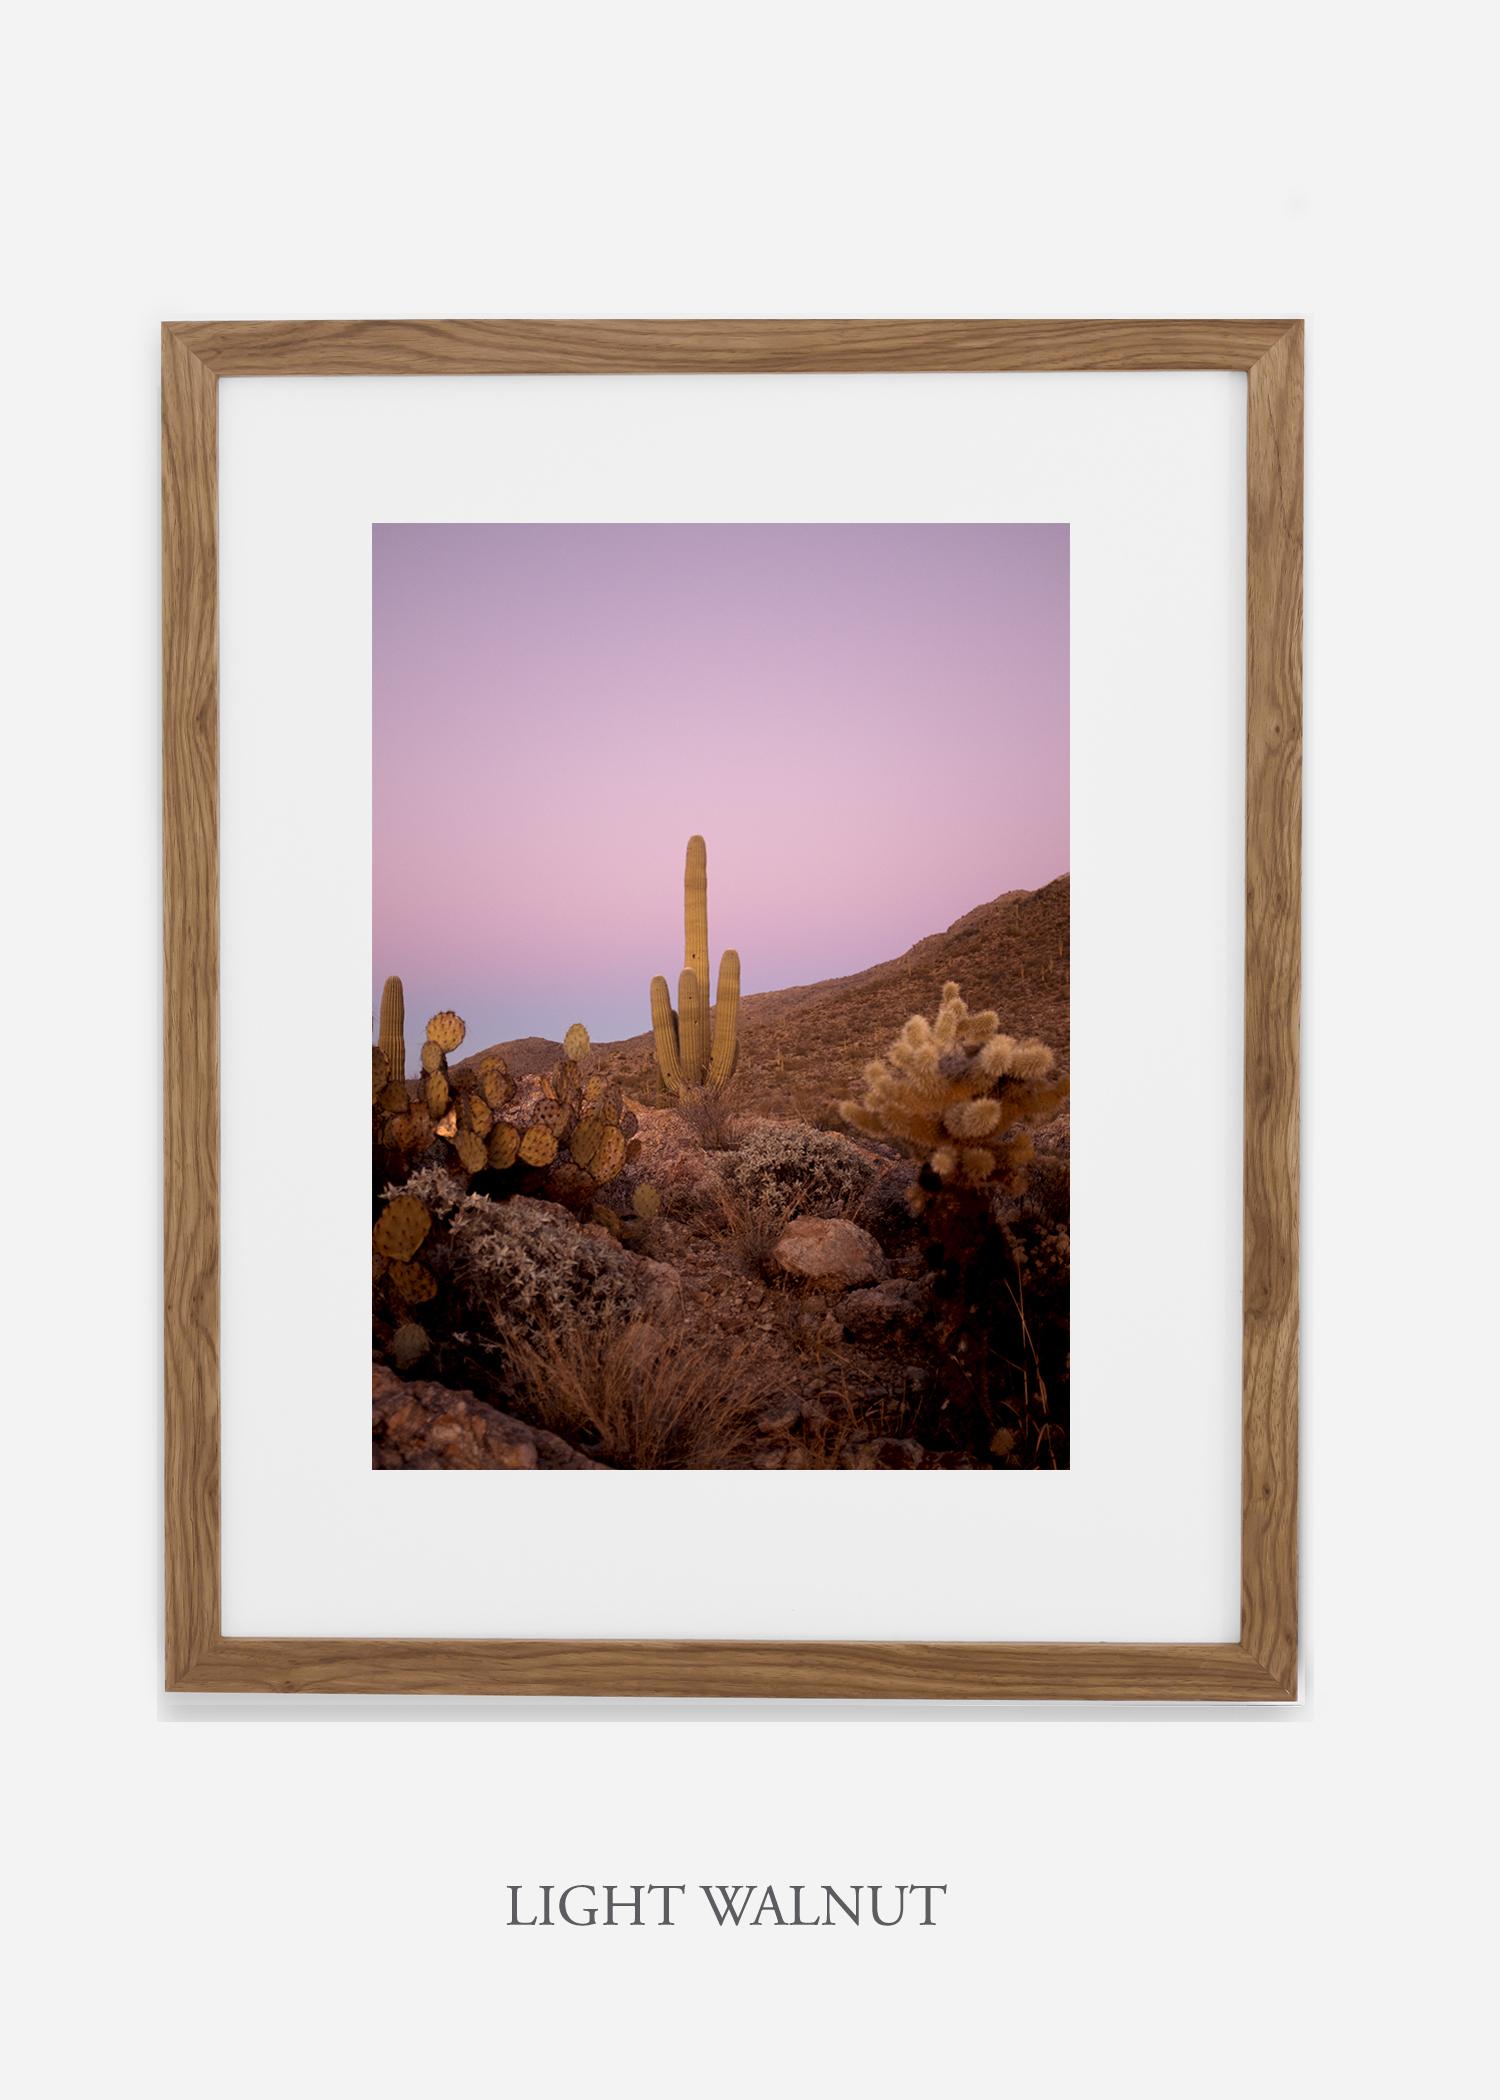 lightwalnutframe-saguaroNo.10-wildercalifornia-art-wallart-cactusprint-homedecor-prints-arizona-botanical-artwork-interiordesign.jpg